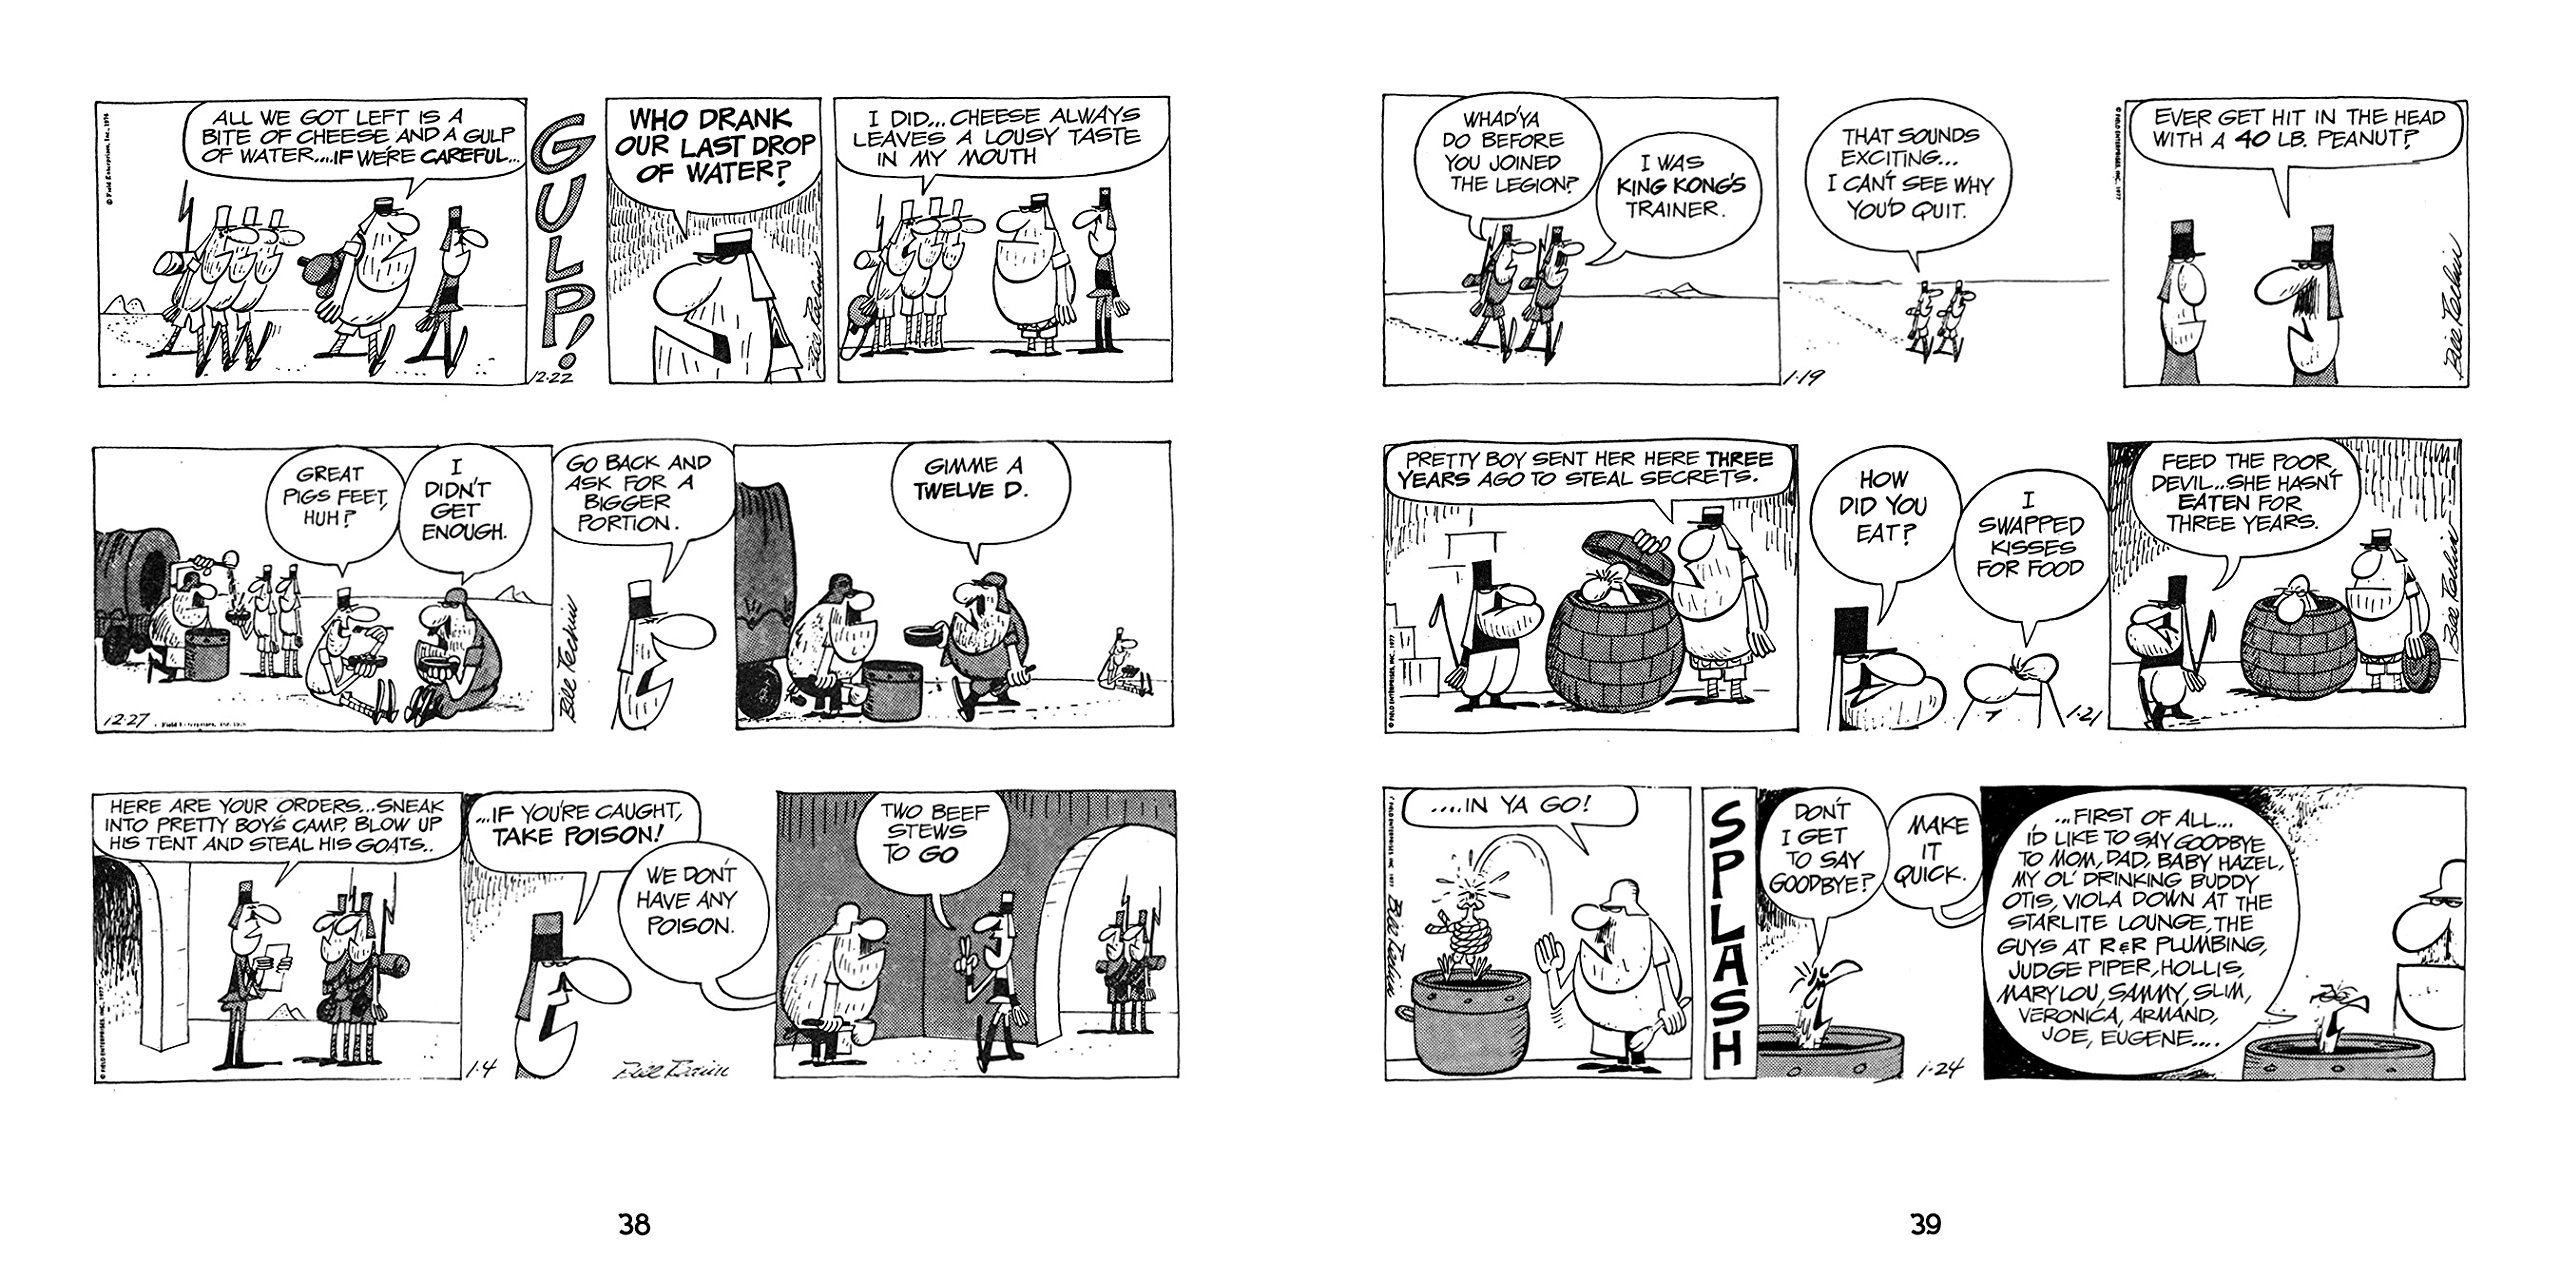 The Best of Crock by Titan Comics (Image #3)